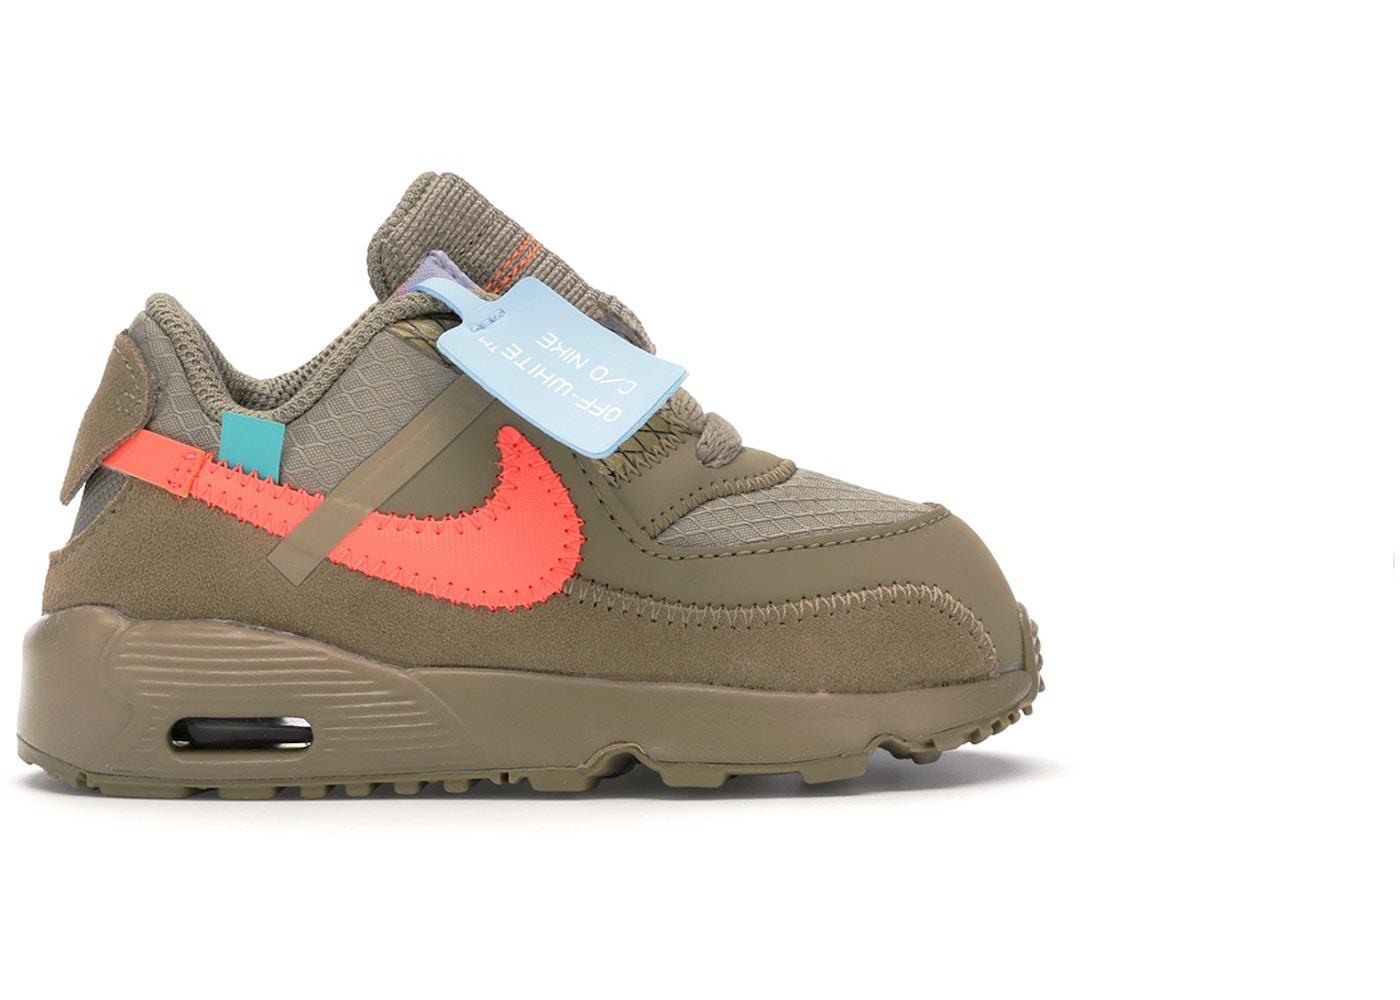 2f89ba209 Buy Nike Air Max 90 Shoes   Deadstock Sneakers